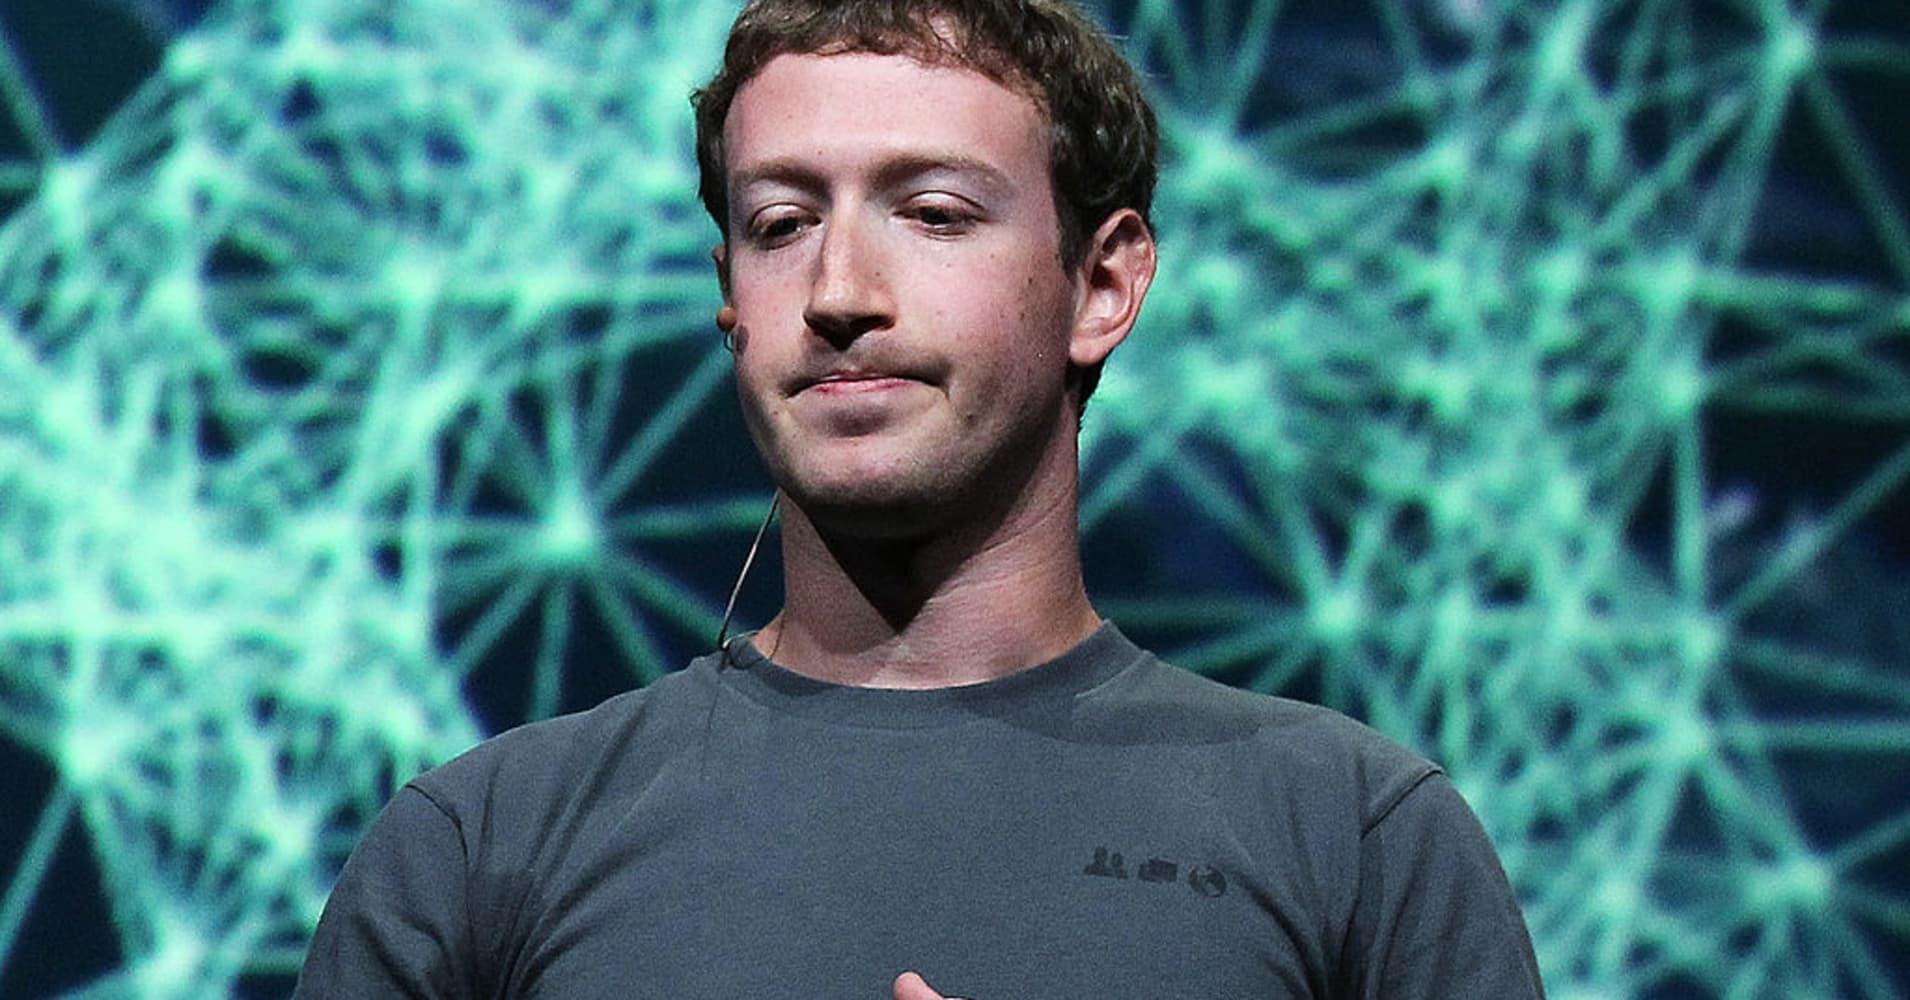 Why Facebook Ceo Mark Zuckerbergs Apology Makes Him A Strong Leader